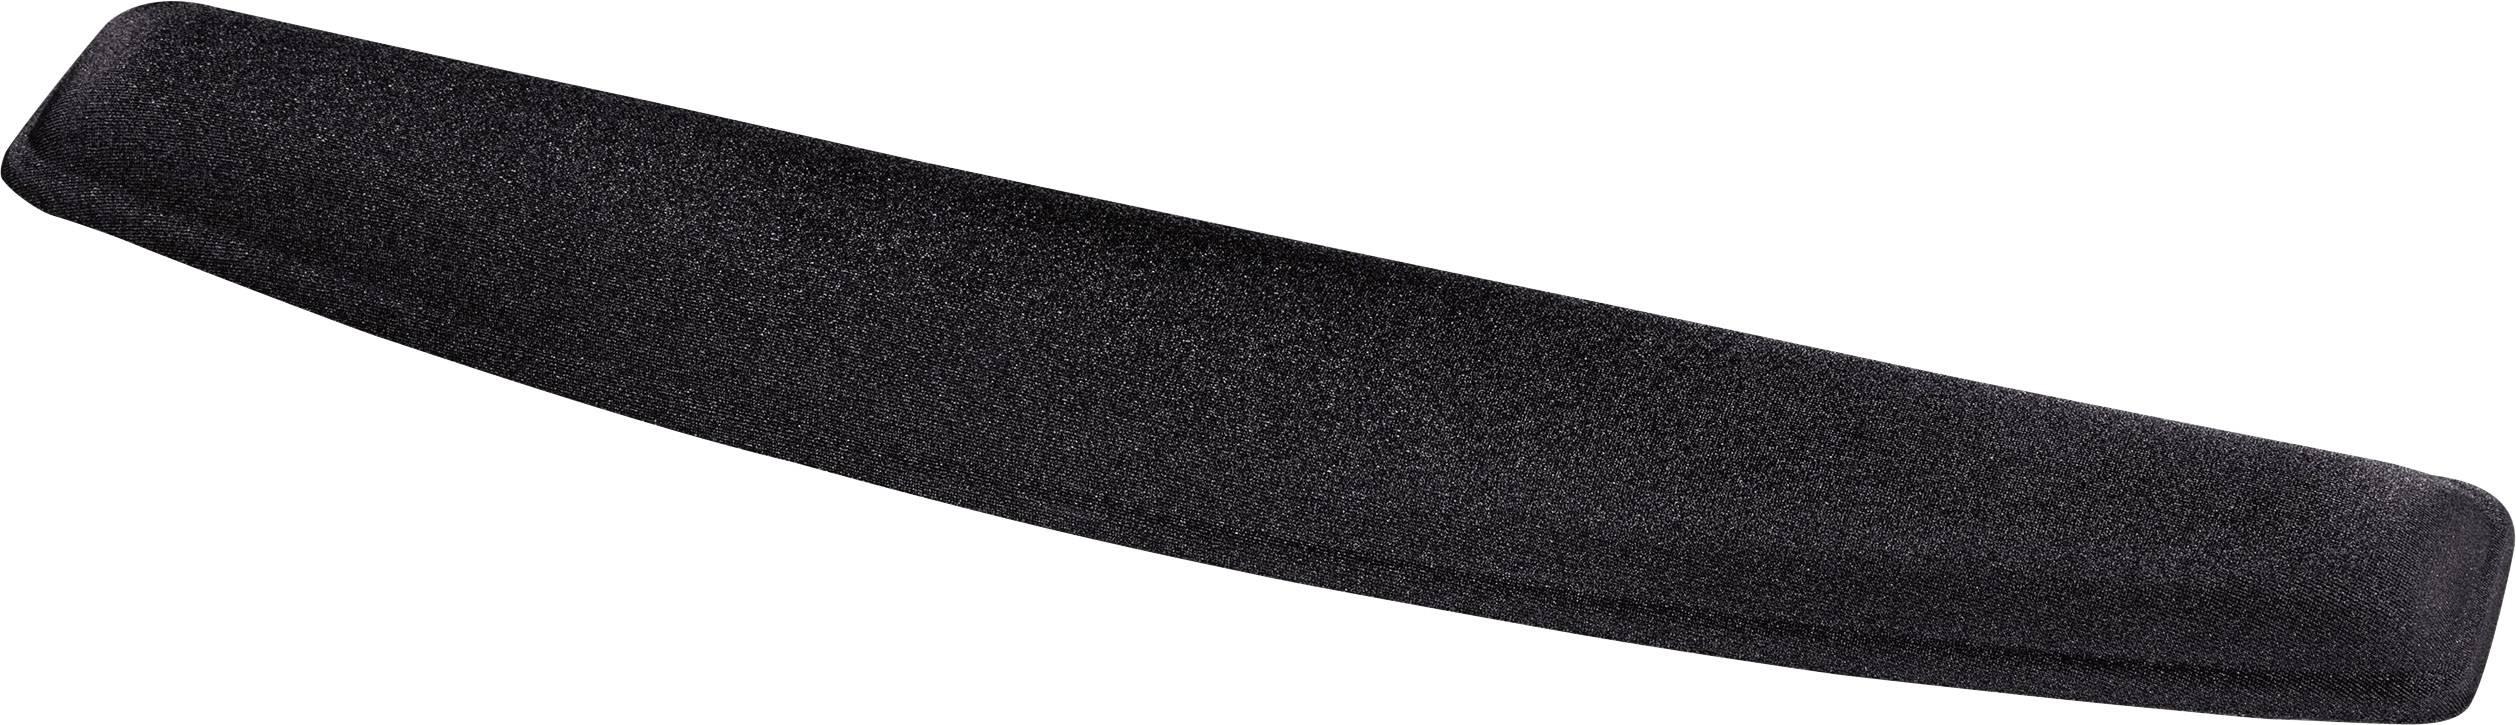 Gélová opierka pod zápästie Hama 00054785ergonomická, 461 x 84 x 18 , čierna